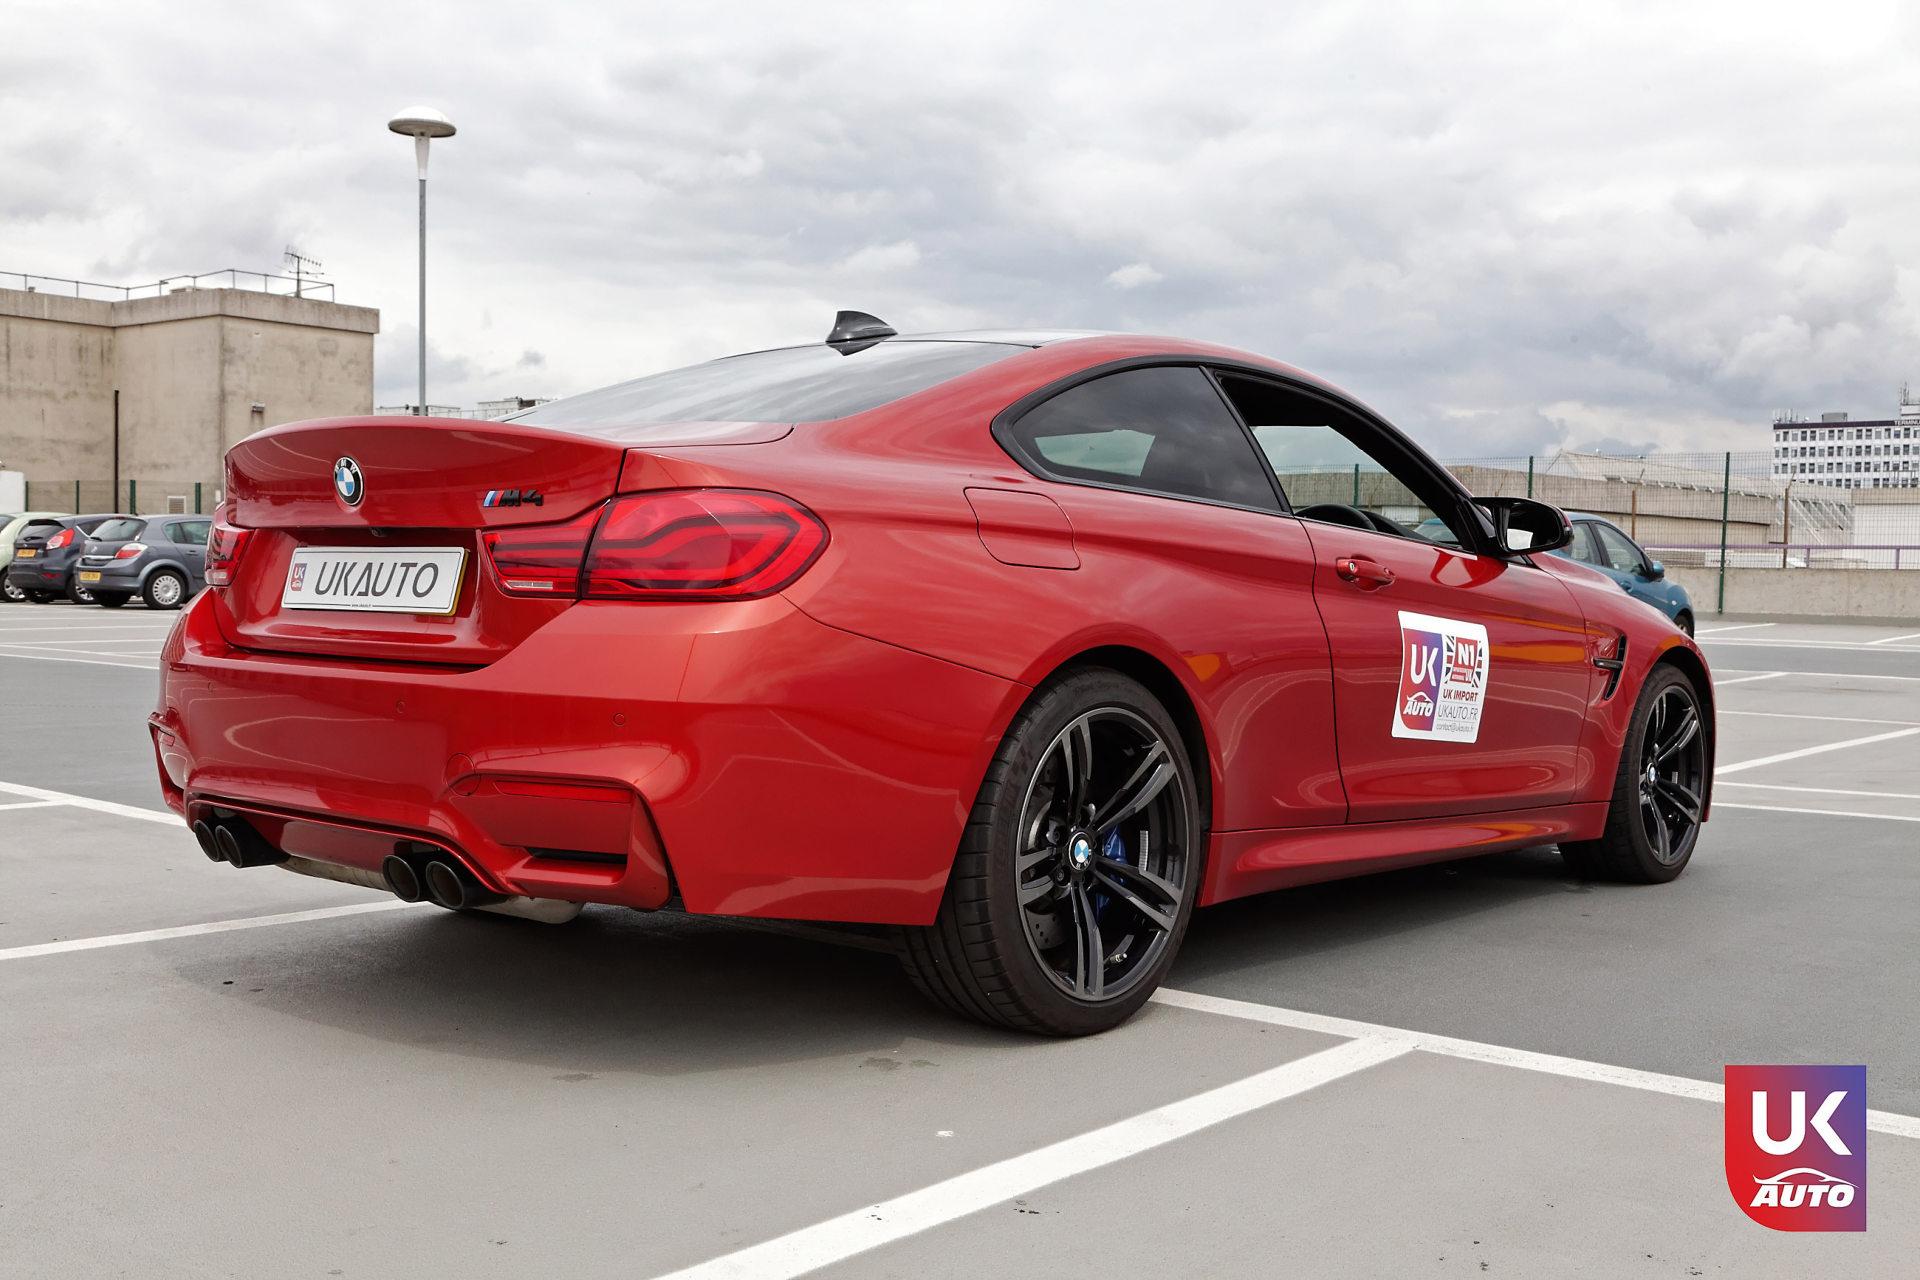 BMW M4 PACK COMPETITION BMW ANGLETERRE BMW IMPORT UK BMW MANDATAIRE AUTO1 DxO - IMPORTATION BMW M4 BMW IMPORT ROYAUME UNI BMW M4 COMPETITION RHD CLIENT UKAUTO